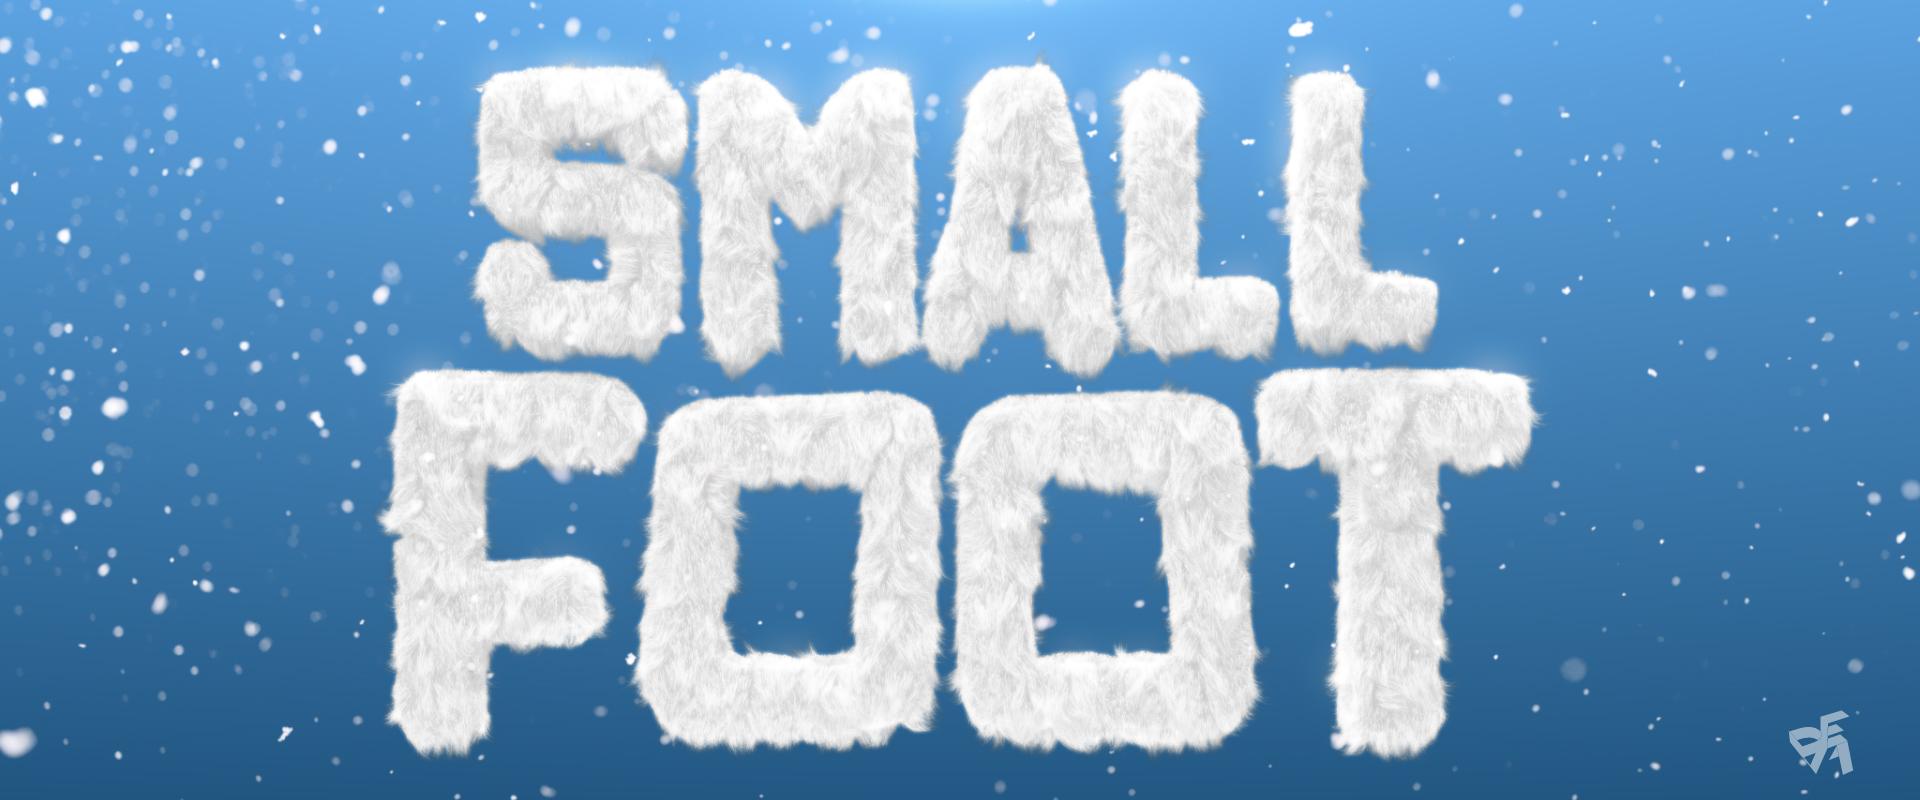 SmallFoot-STYLEFRAME_01.jpg